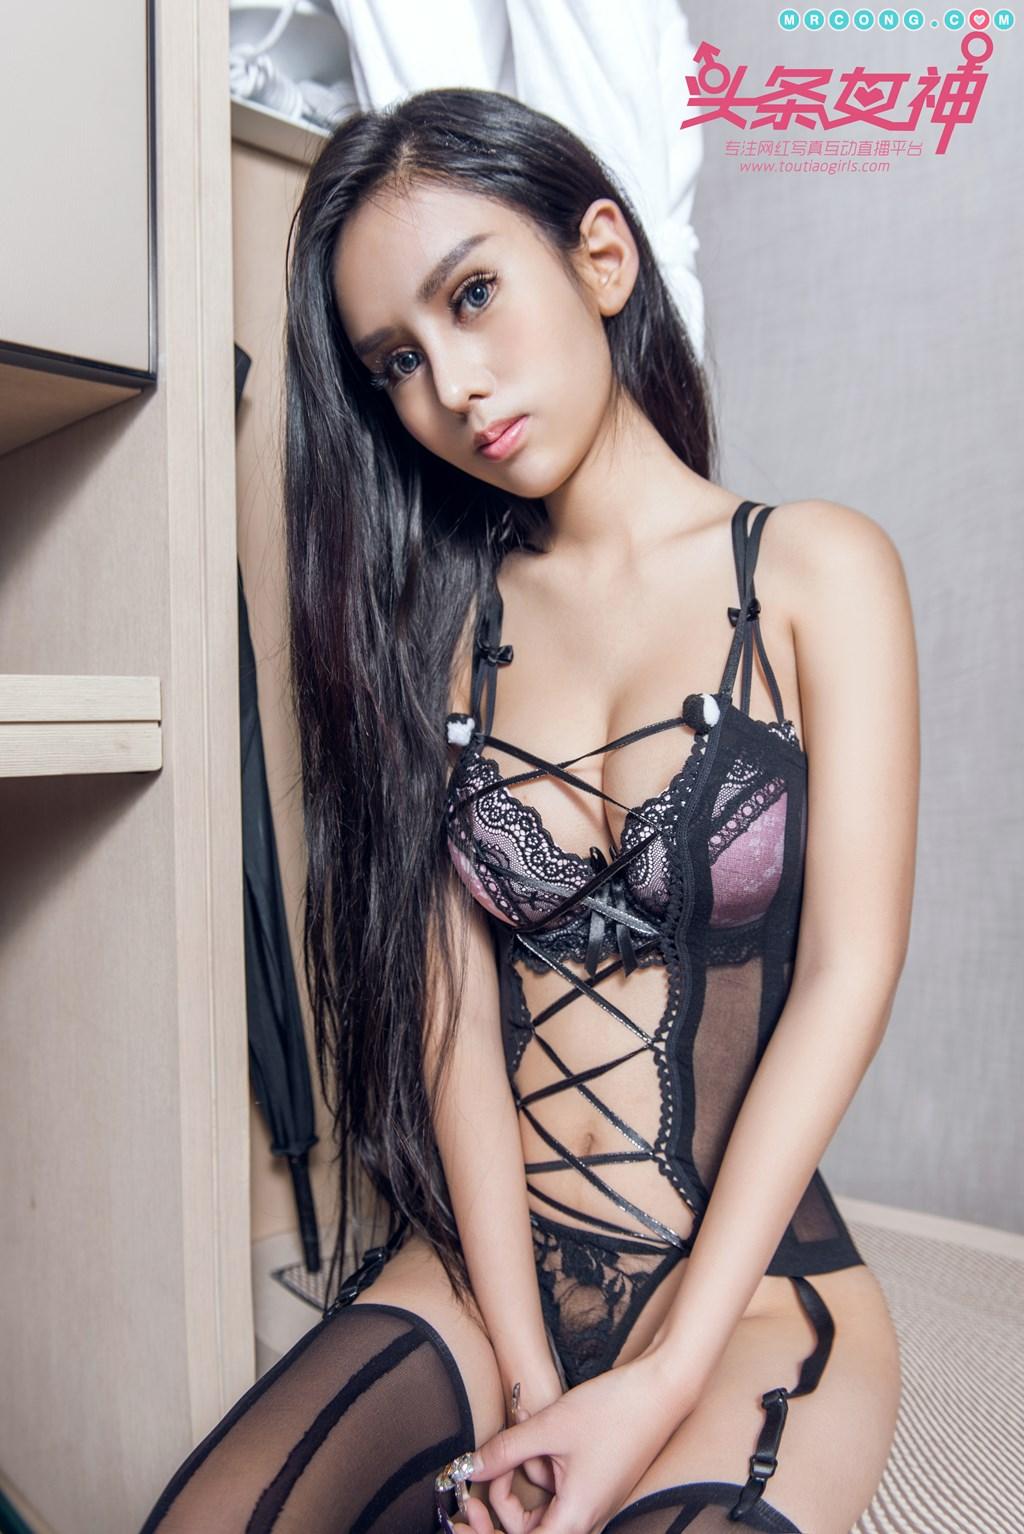 Image TouTiao-2017-12-05-Chen-Di-Ya-MrCong.com-027 in post TouTiao 2017-12-05: Người mẫu Chen Di Ya (陈迪垭) (35 ảnh)